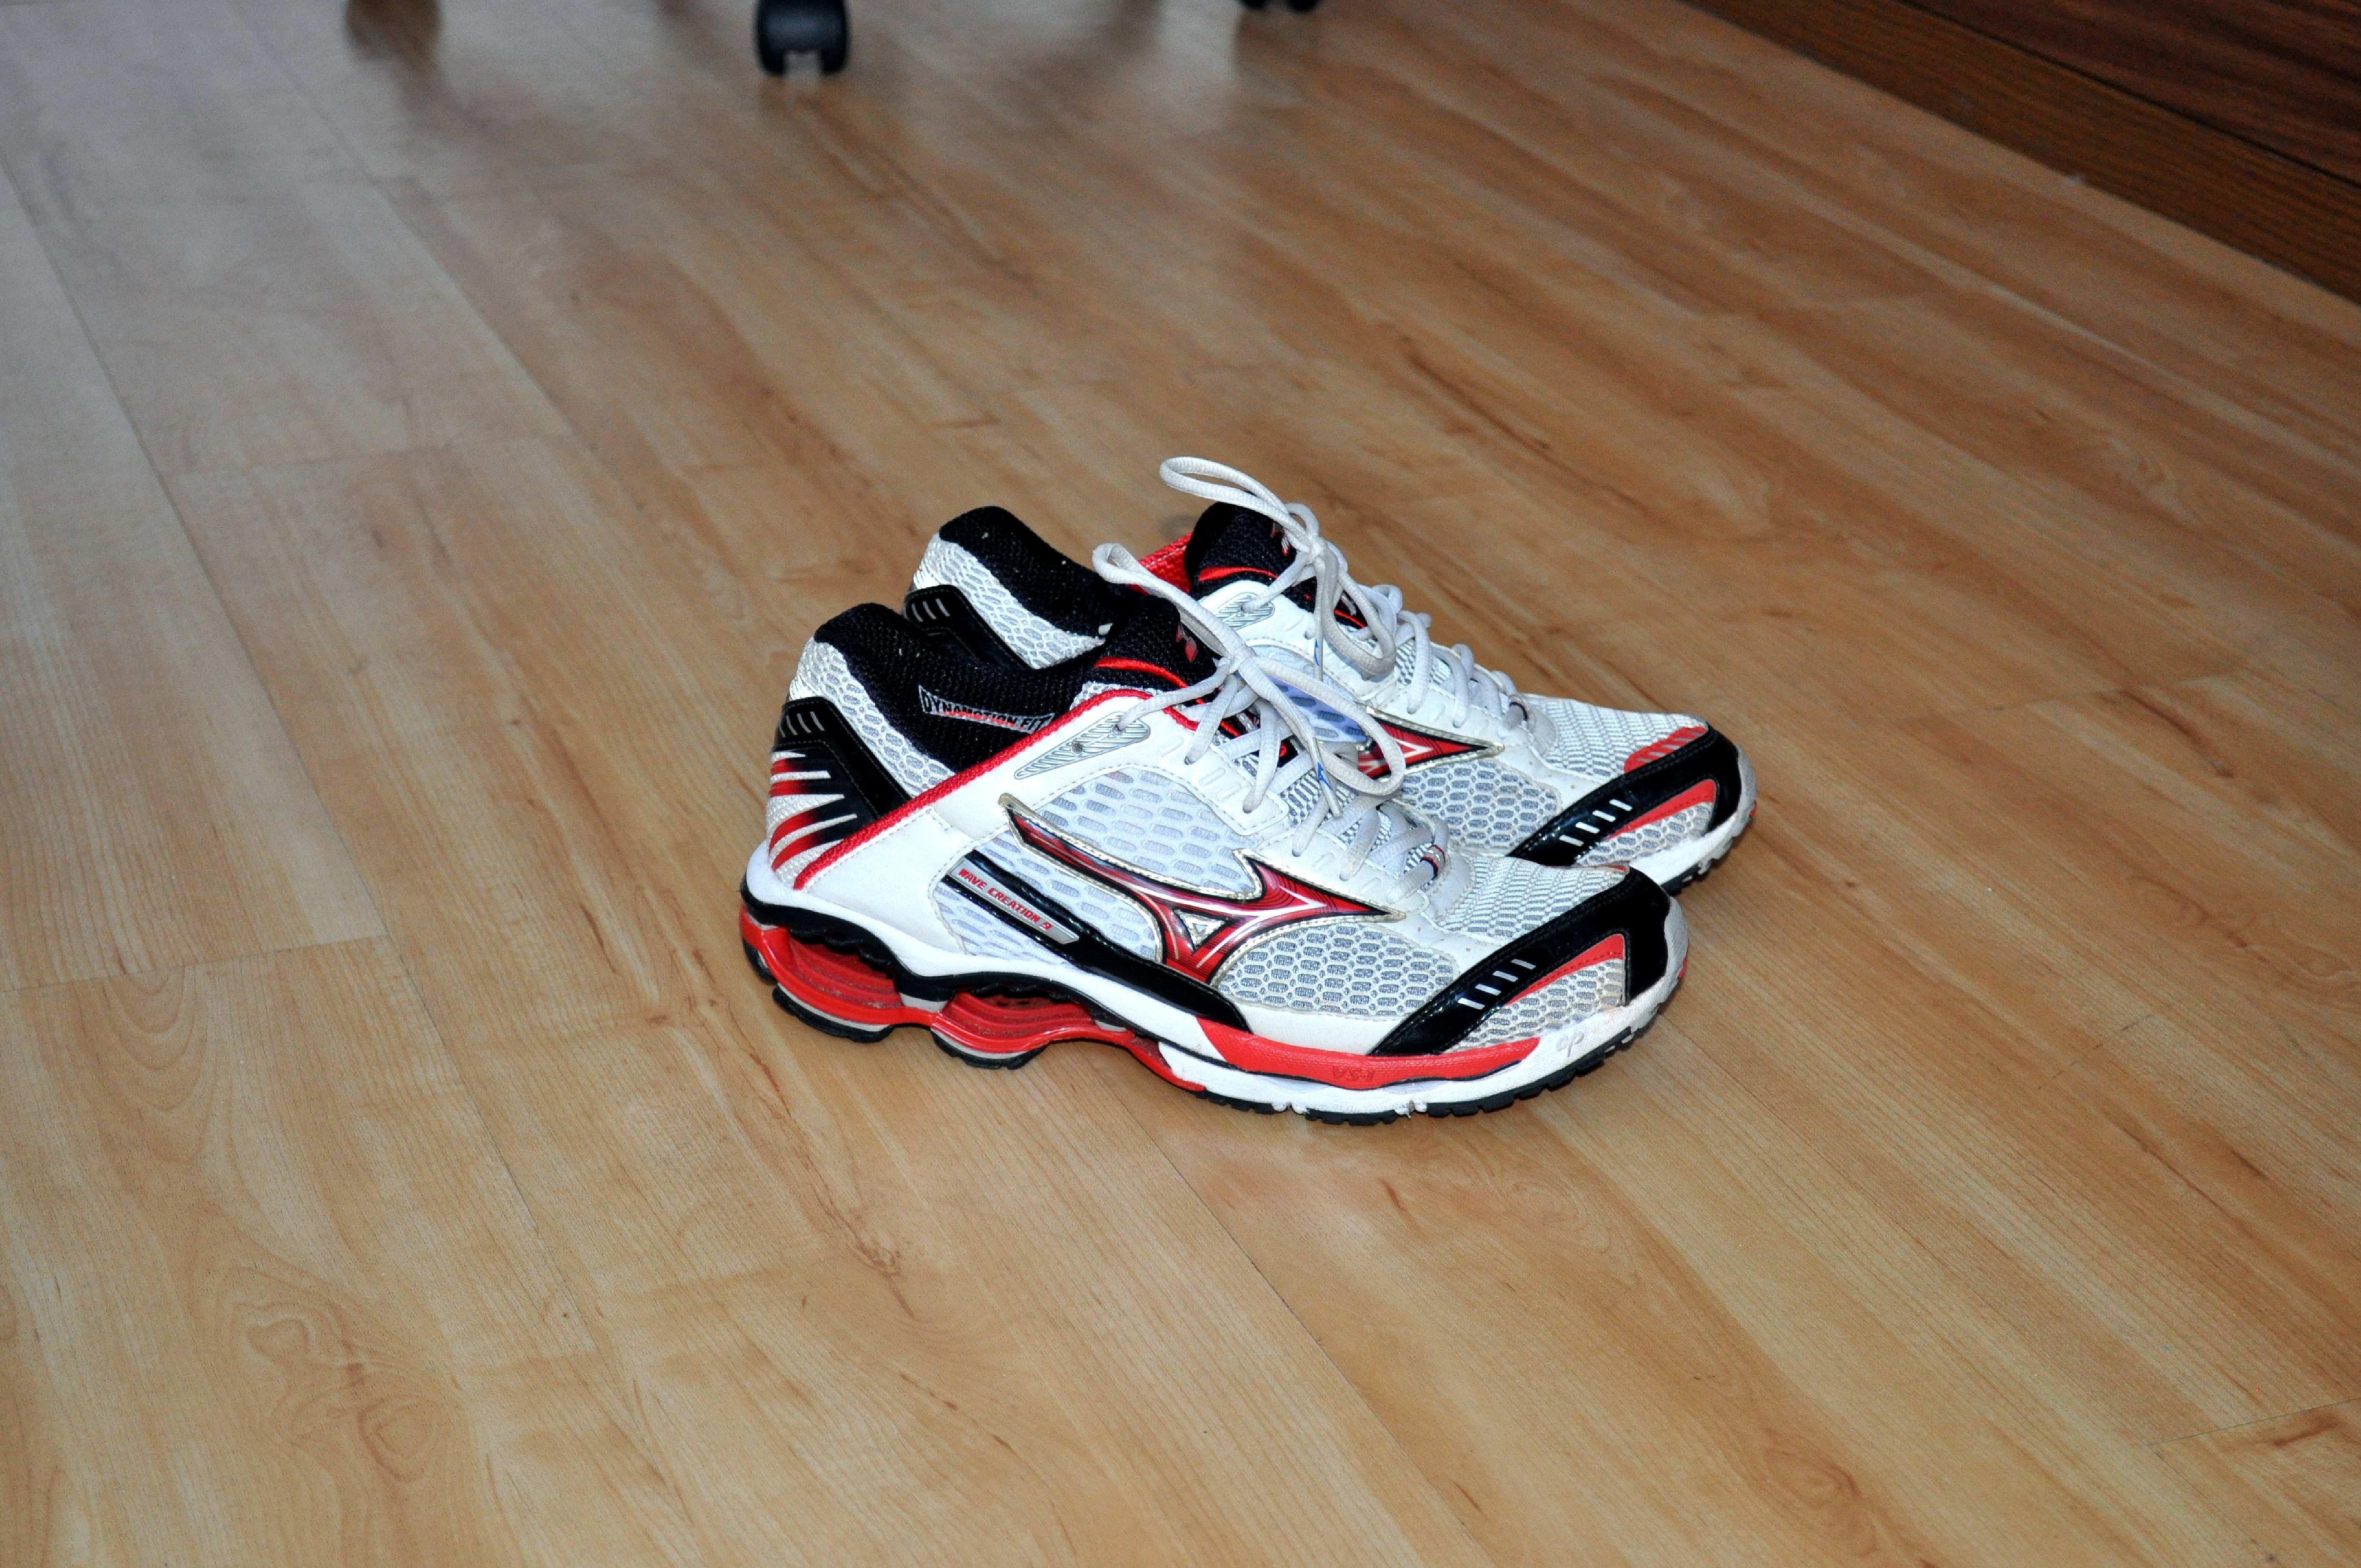 Free photograph; new, modern, running, shoes, floor